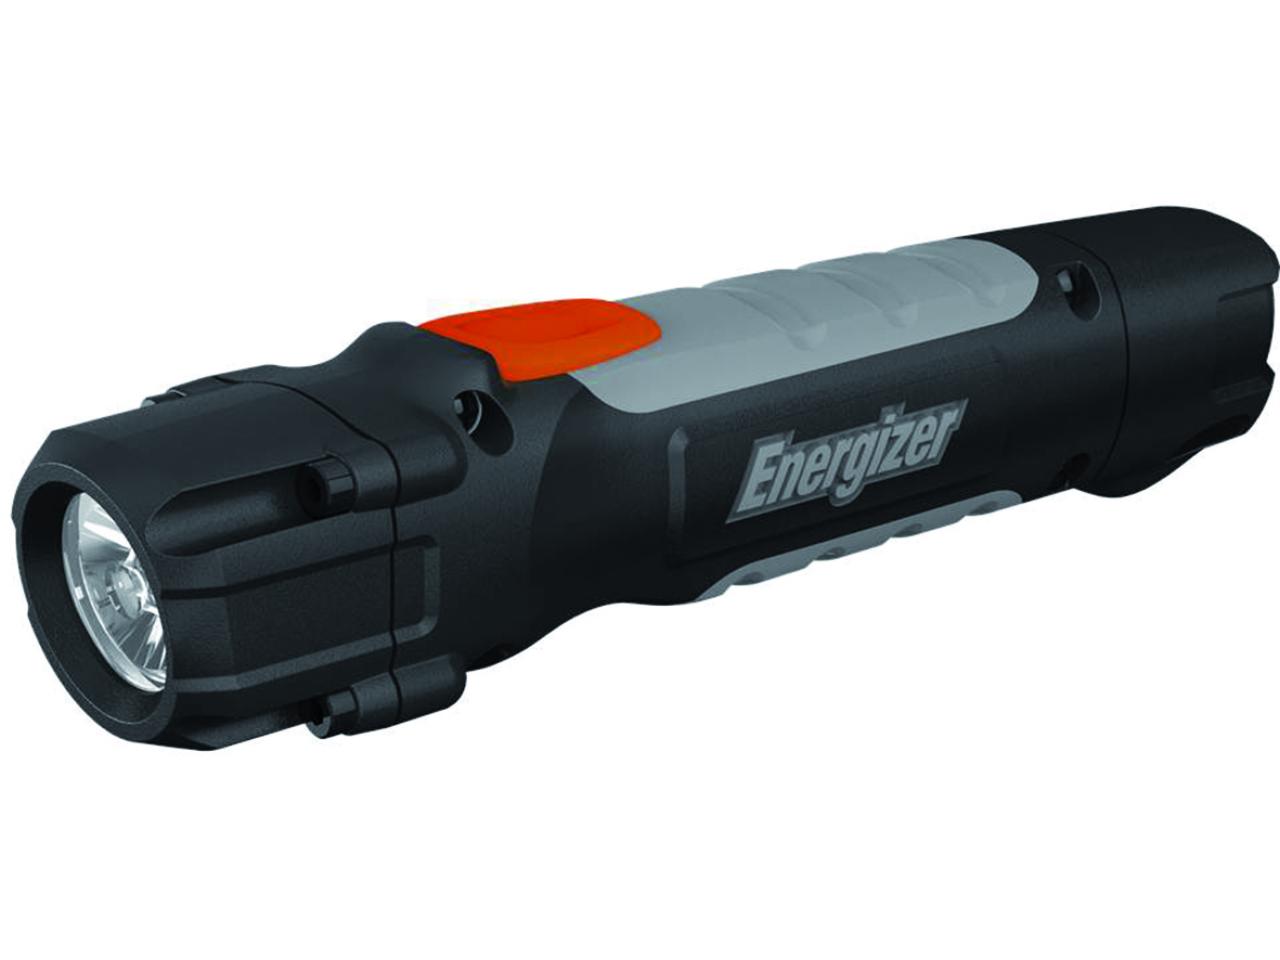 Torche 41 Pro2 Lampe 25€ Energizer Aa 250 Hardcase cR5q4jLA3